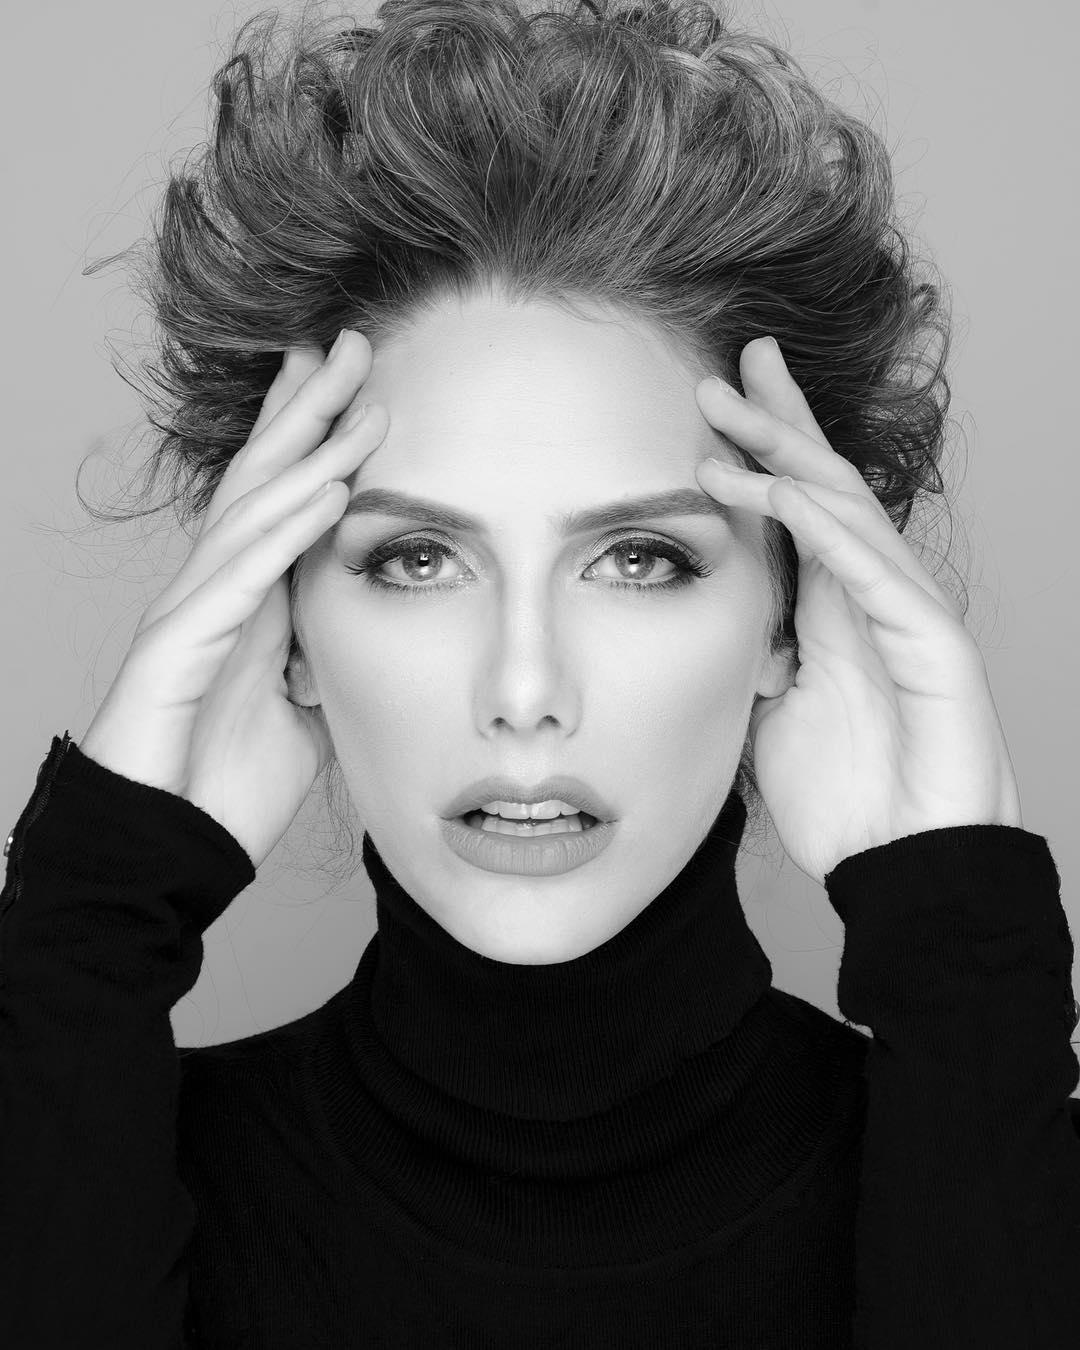 angela ponce, miss espana universo 2018. - Página 4 40696811